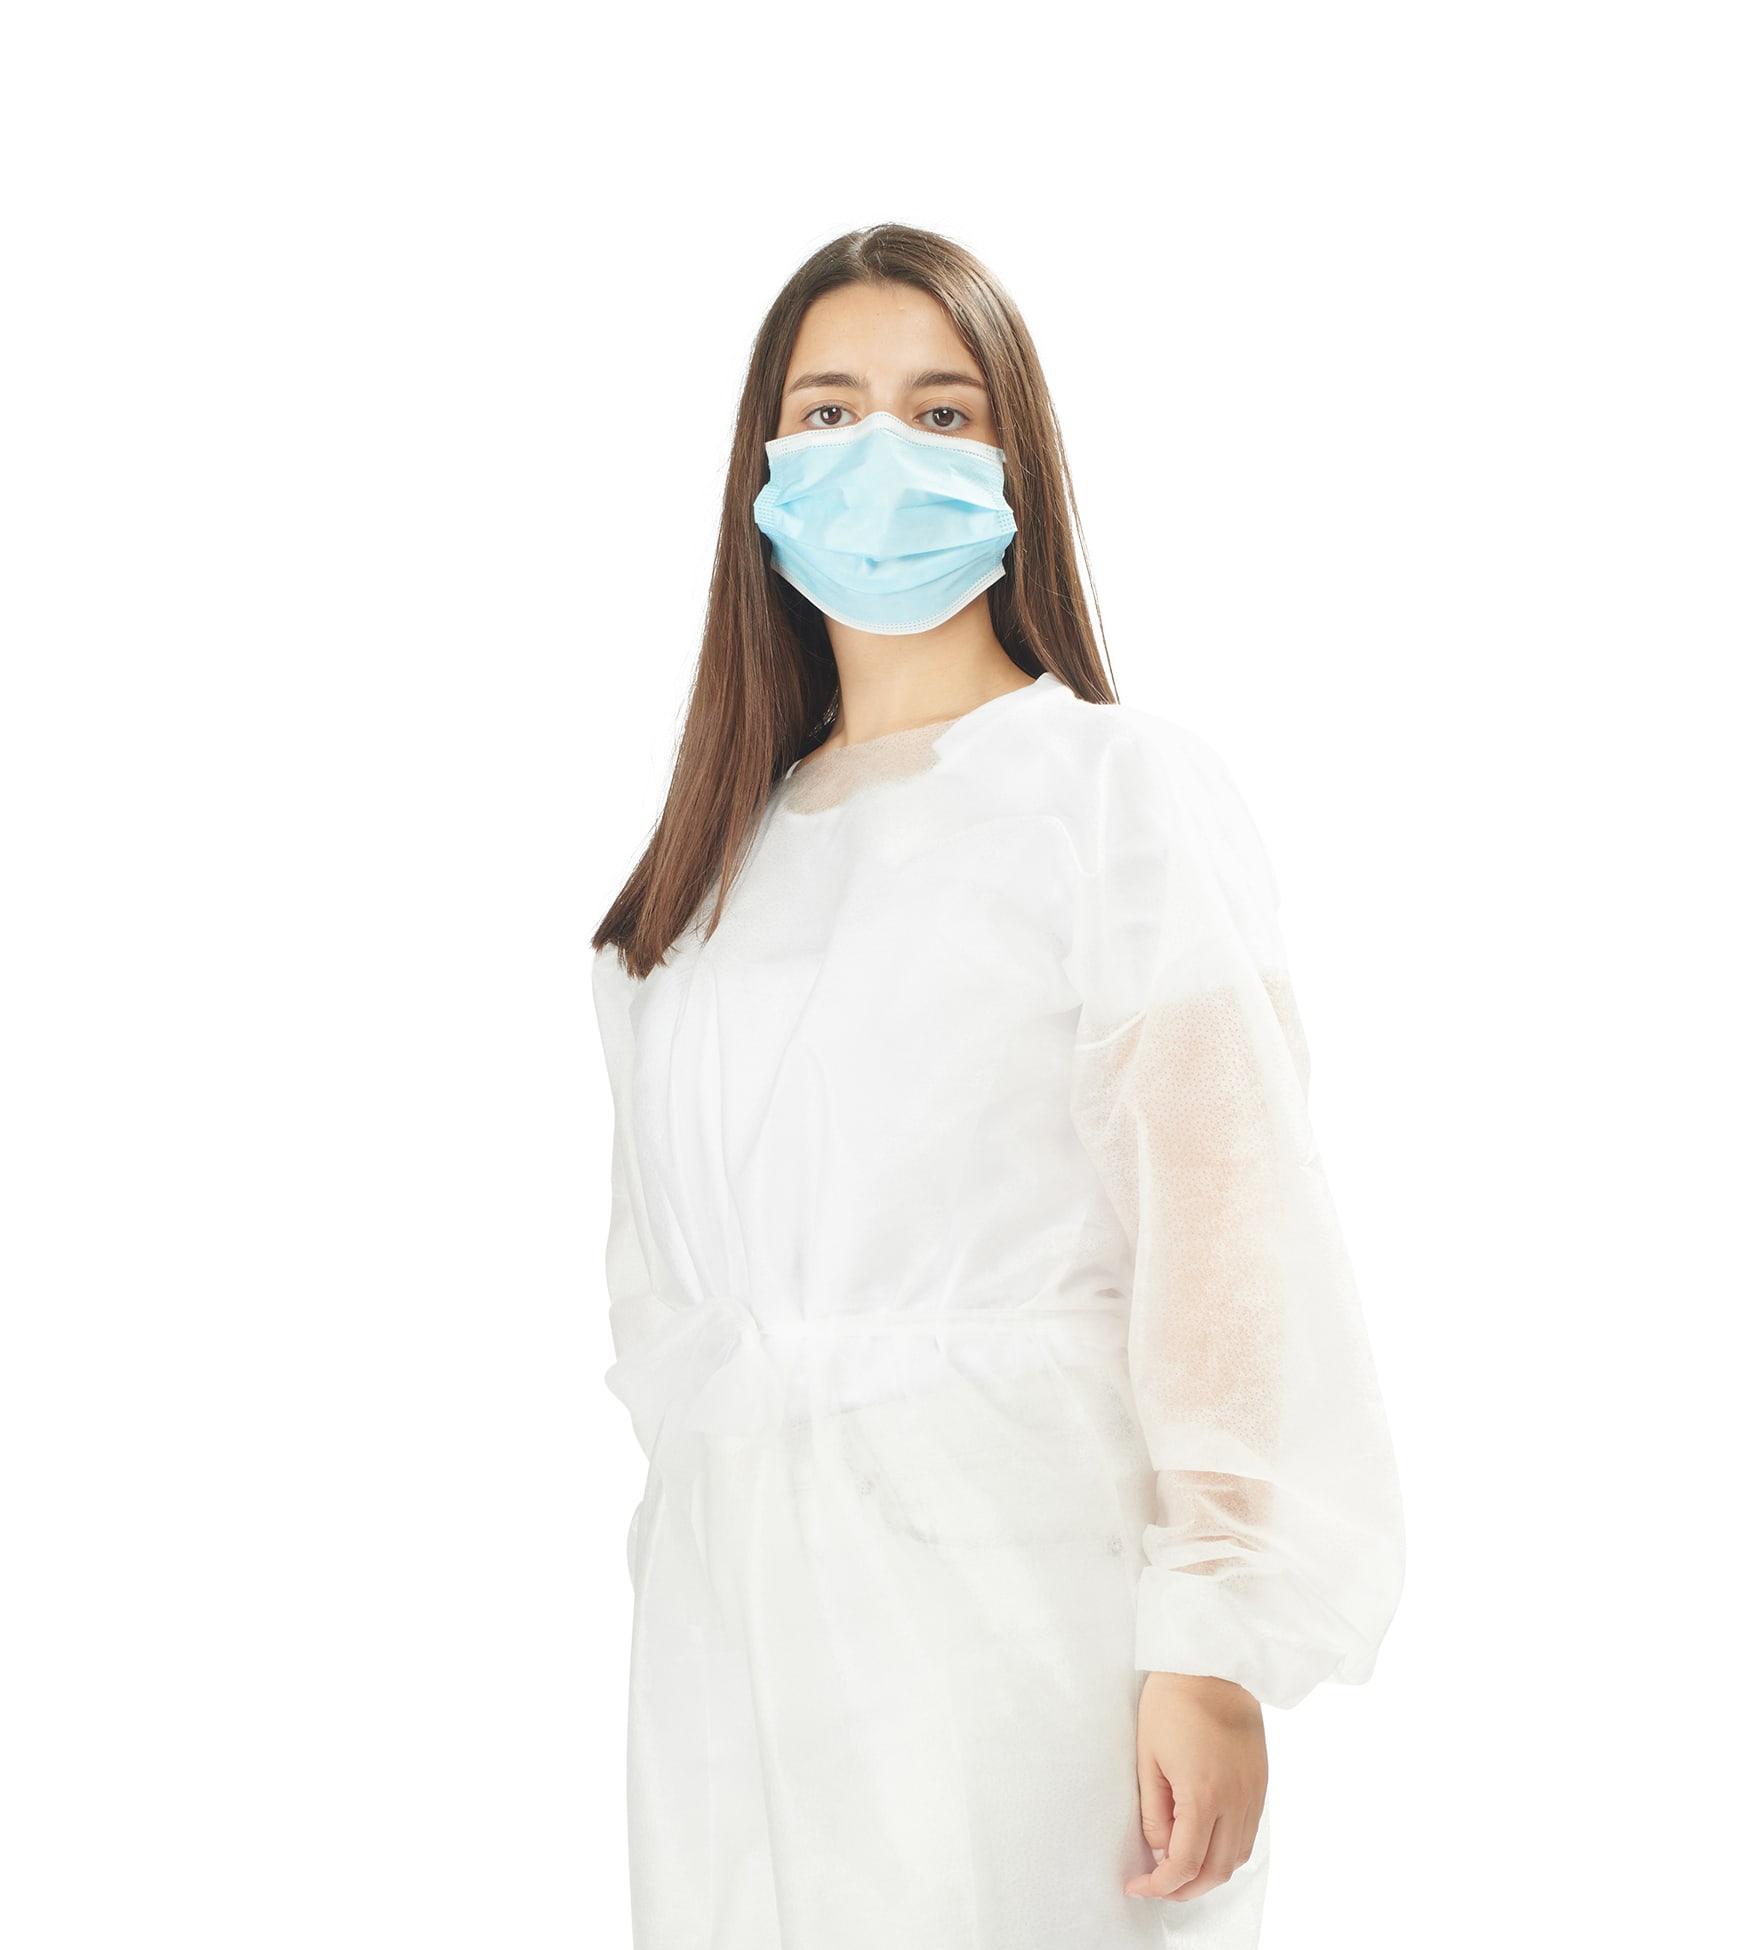 batas hidrófugas 25g 4 - 25g water repellent gowns - clothe protect